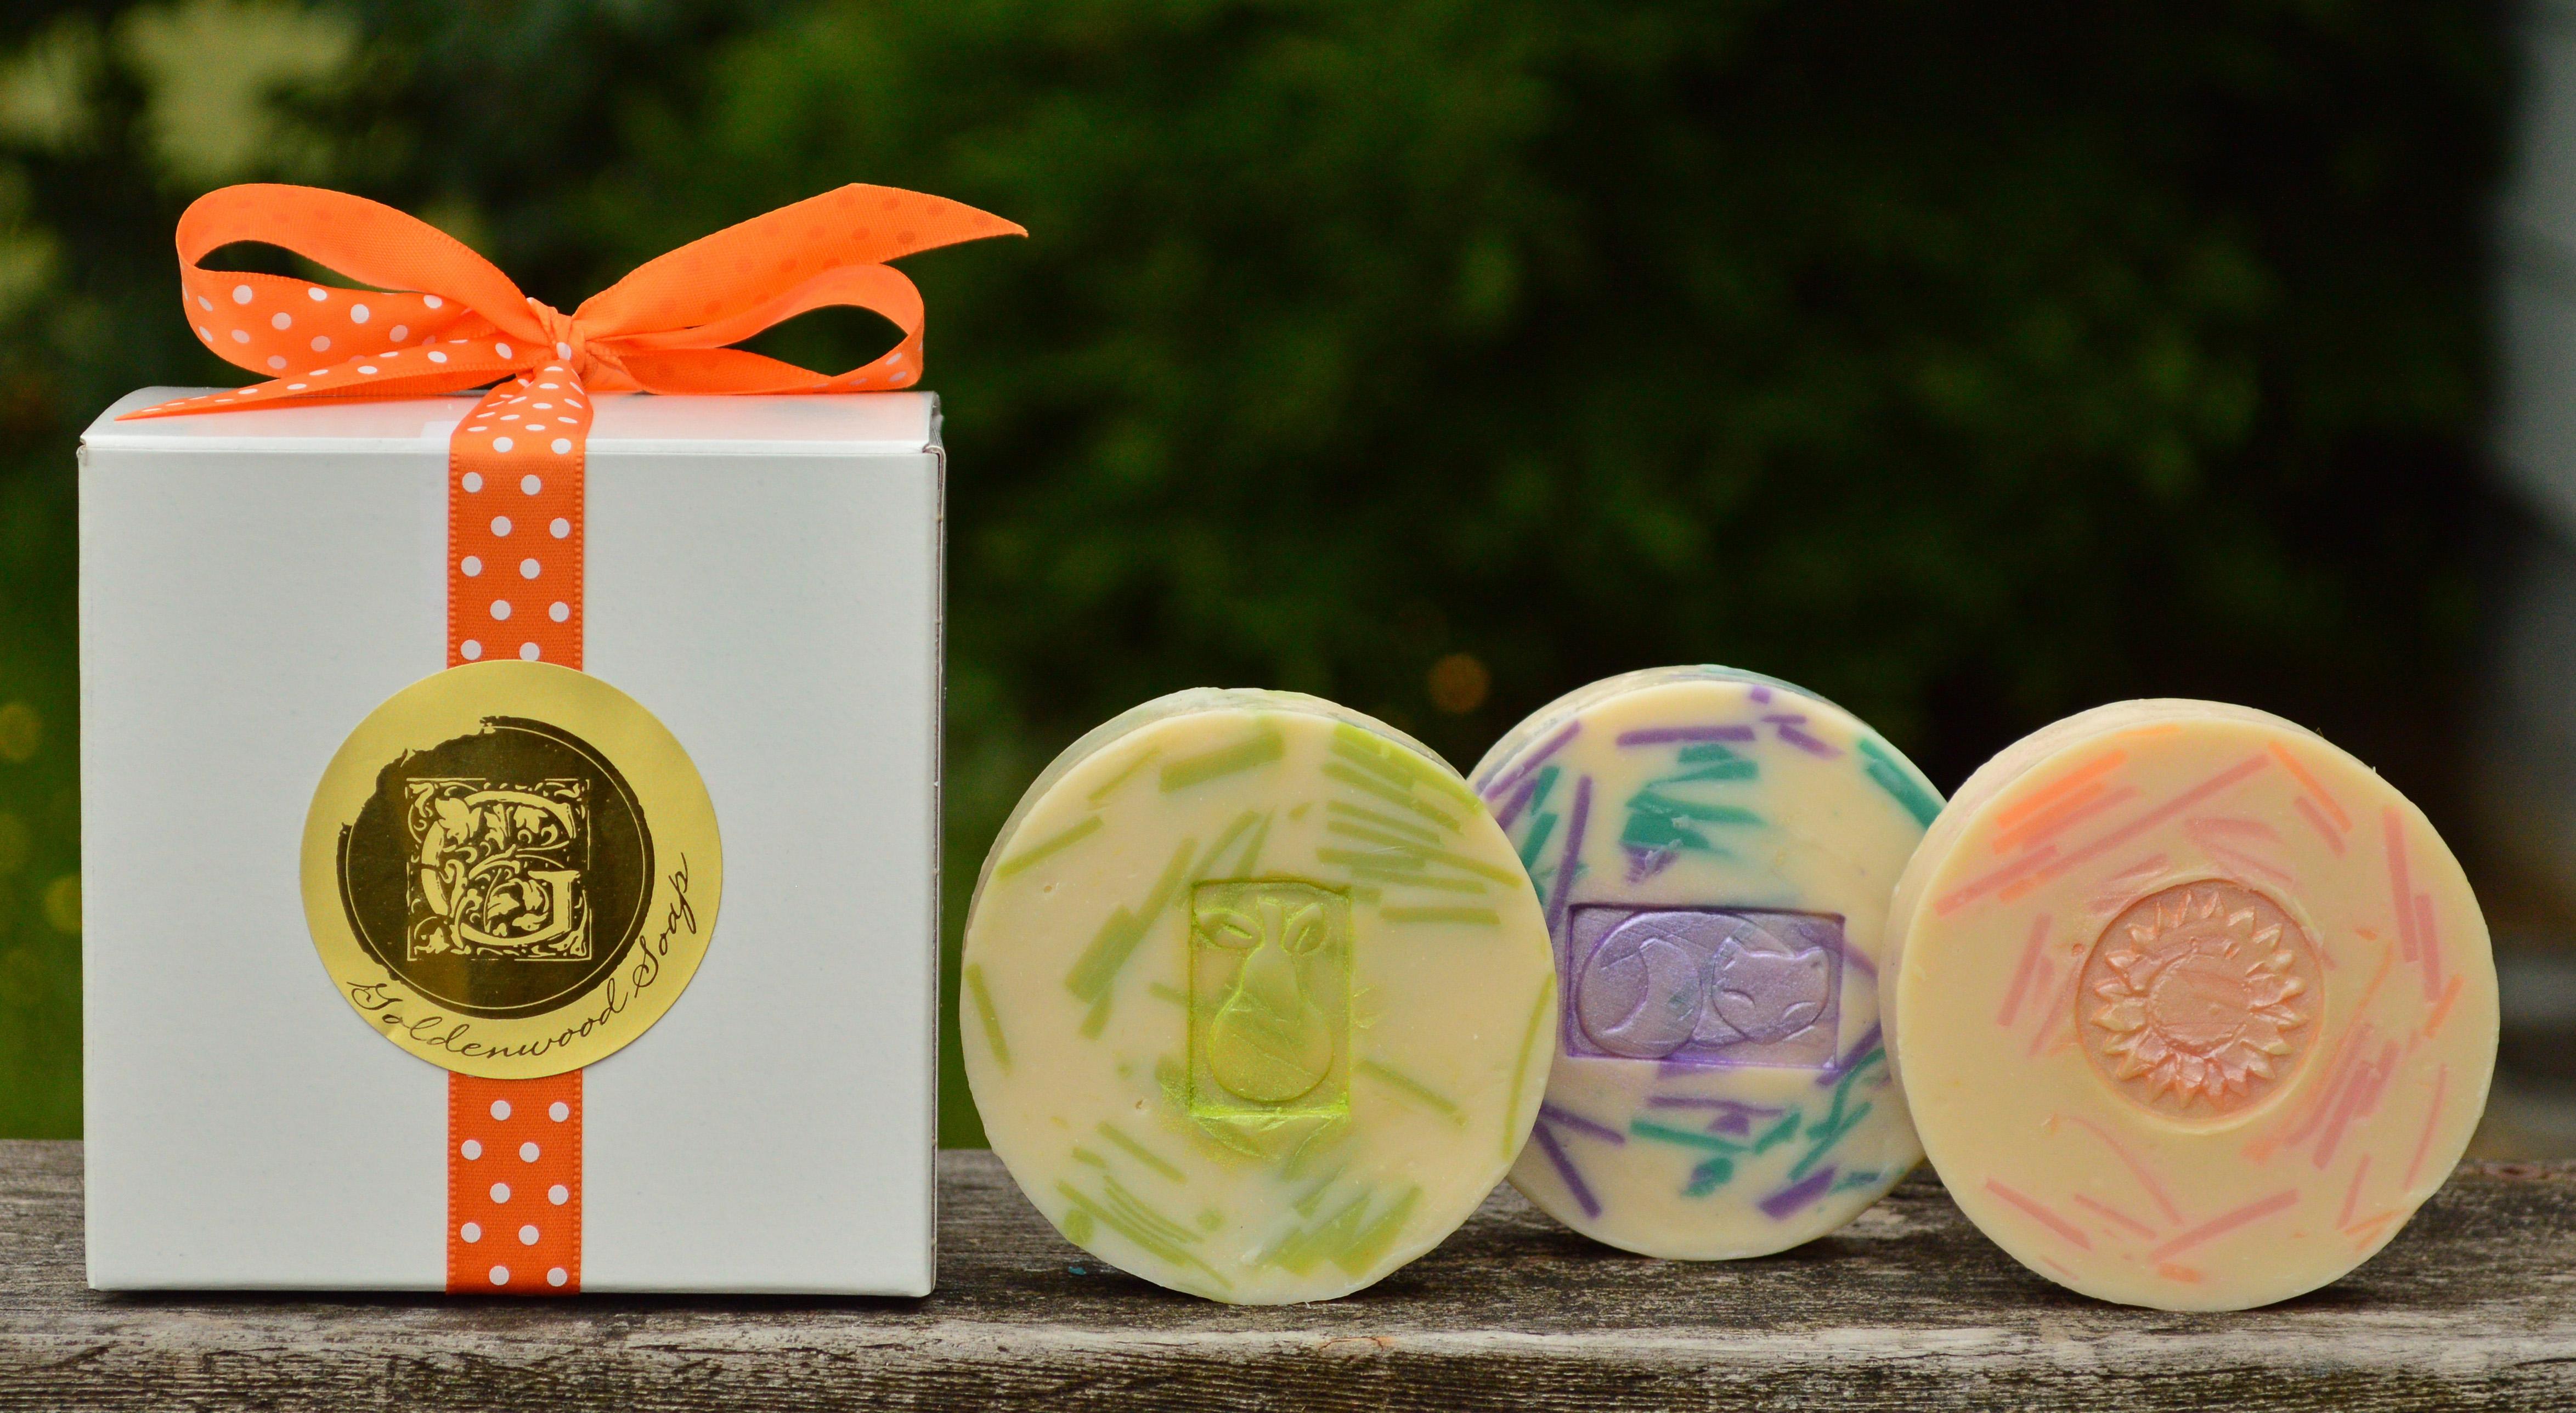 Customer Favorites Soap Collection - Green Tea & Pear Classic Goat Milk Soap, English Lavender & Mint Classic Goat Milk Soap, Grapefruit Twist Classic Goat Milk Soap.